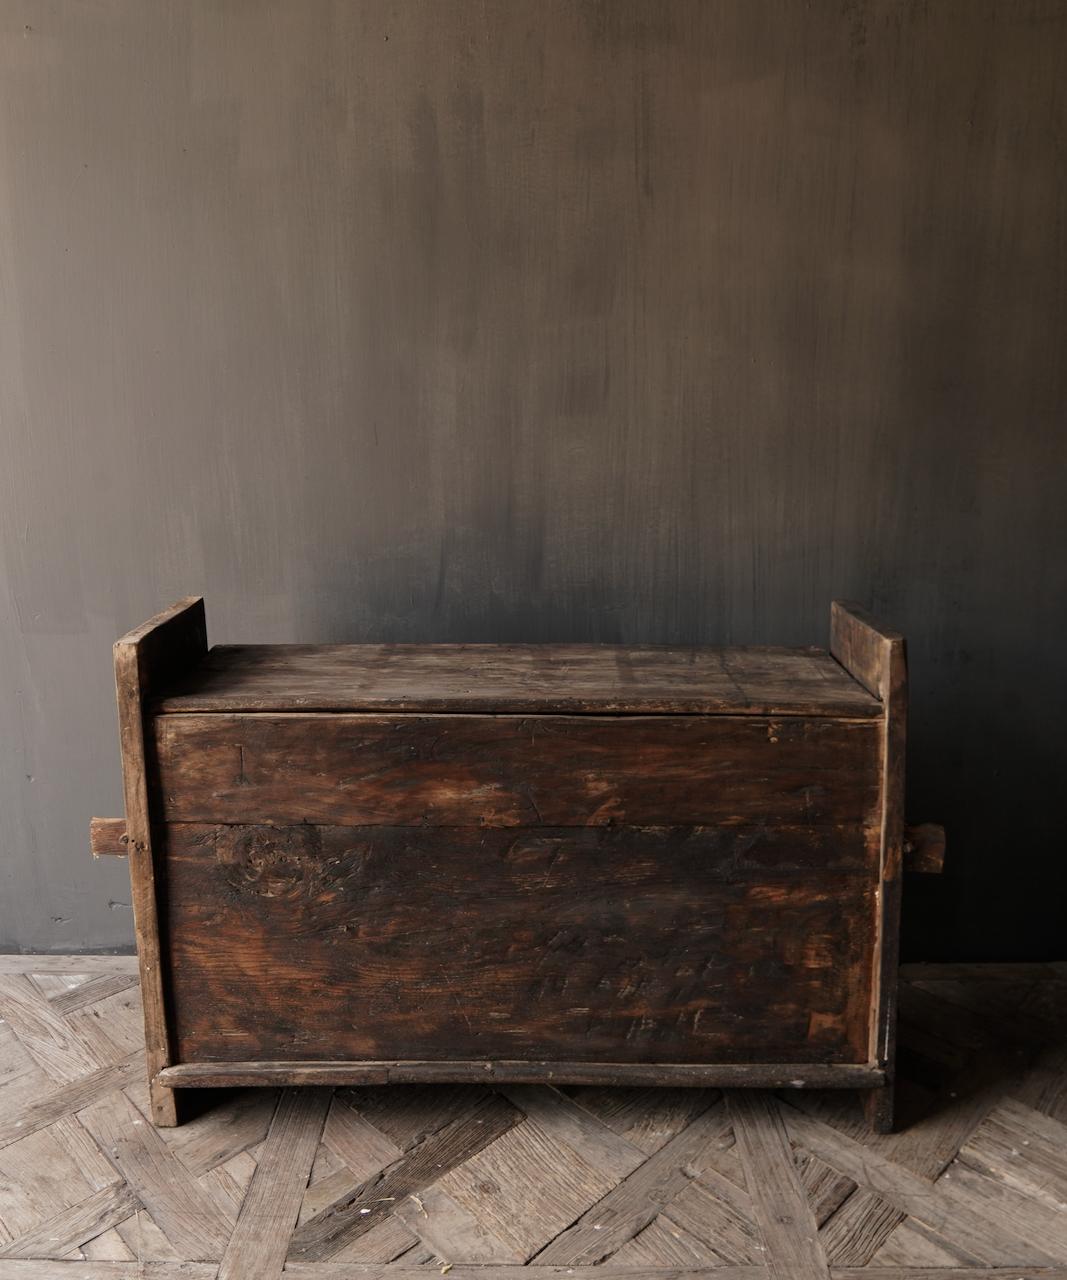 Robuste alte Himalaya-Truhe / Box mit Holzschnitzerei-7